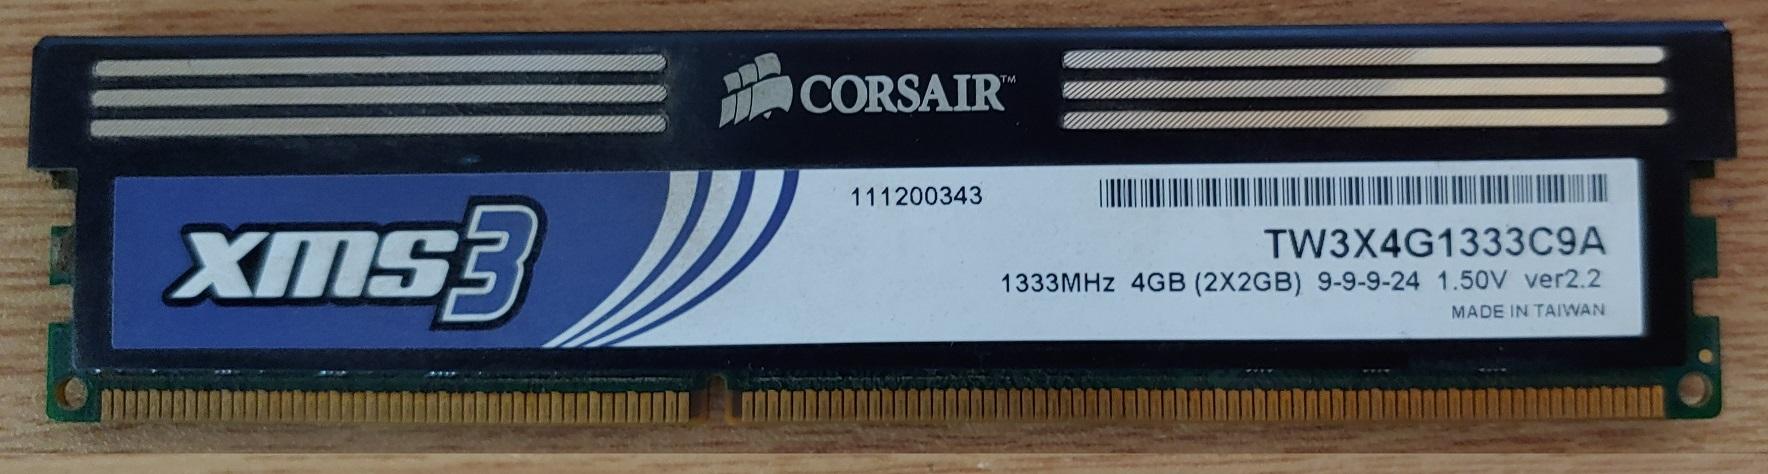 cosair server ram $4GB sticks